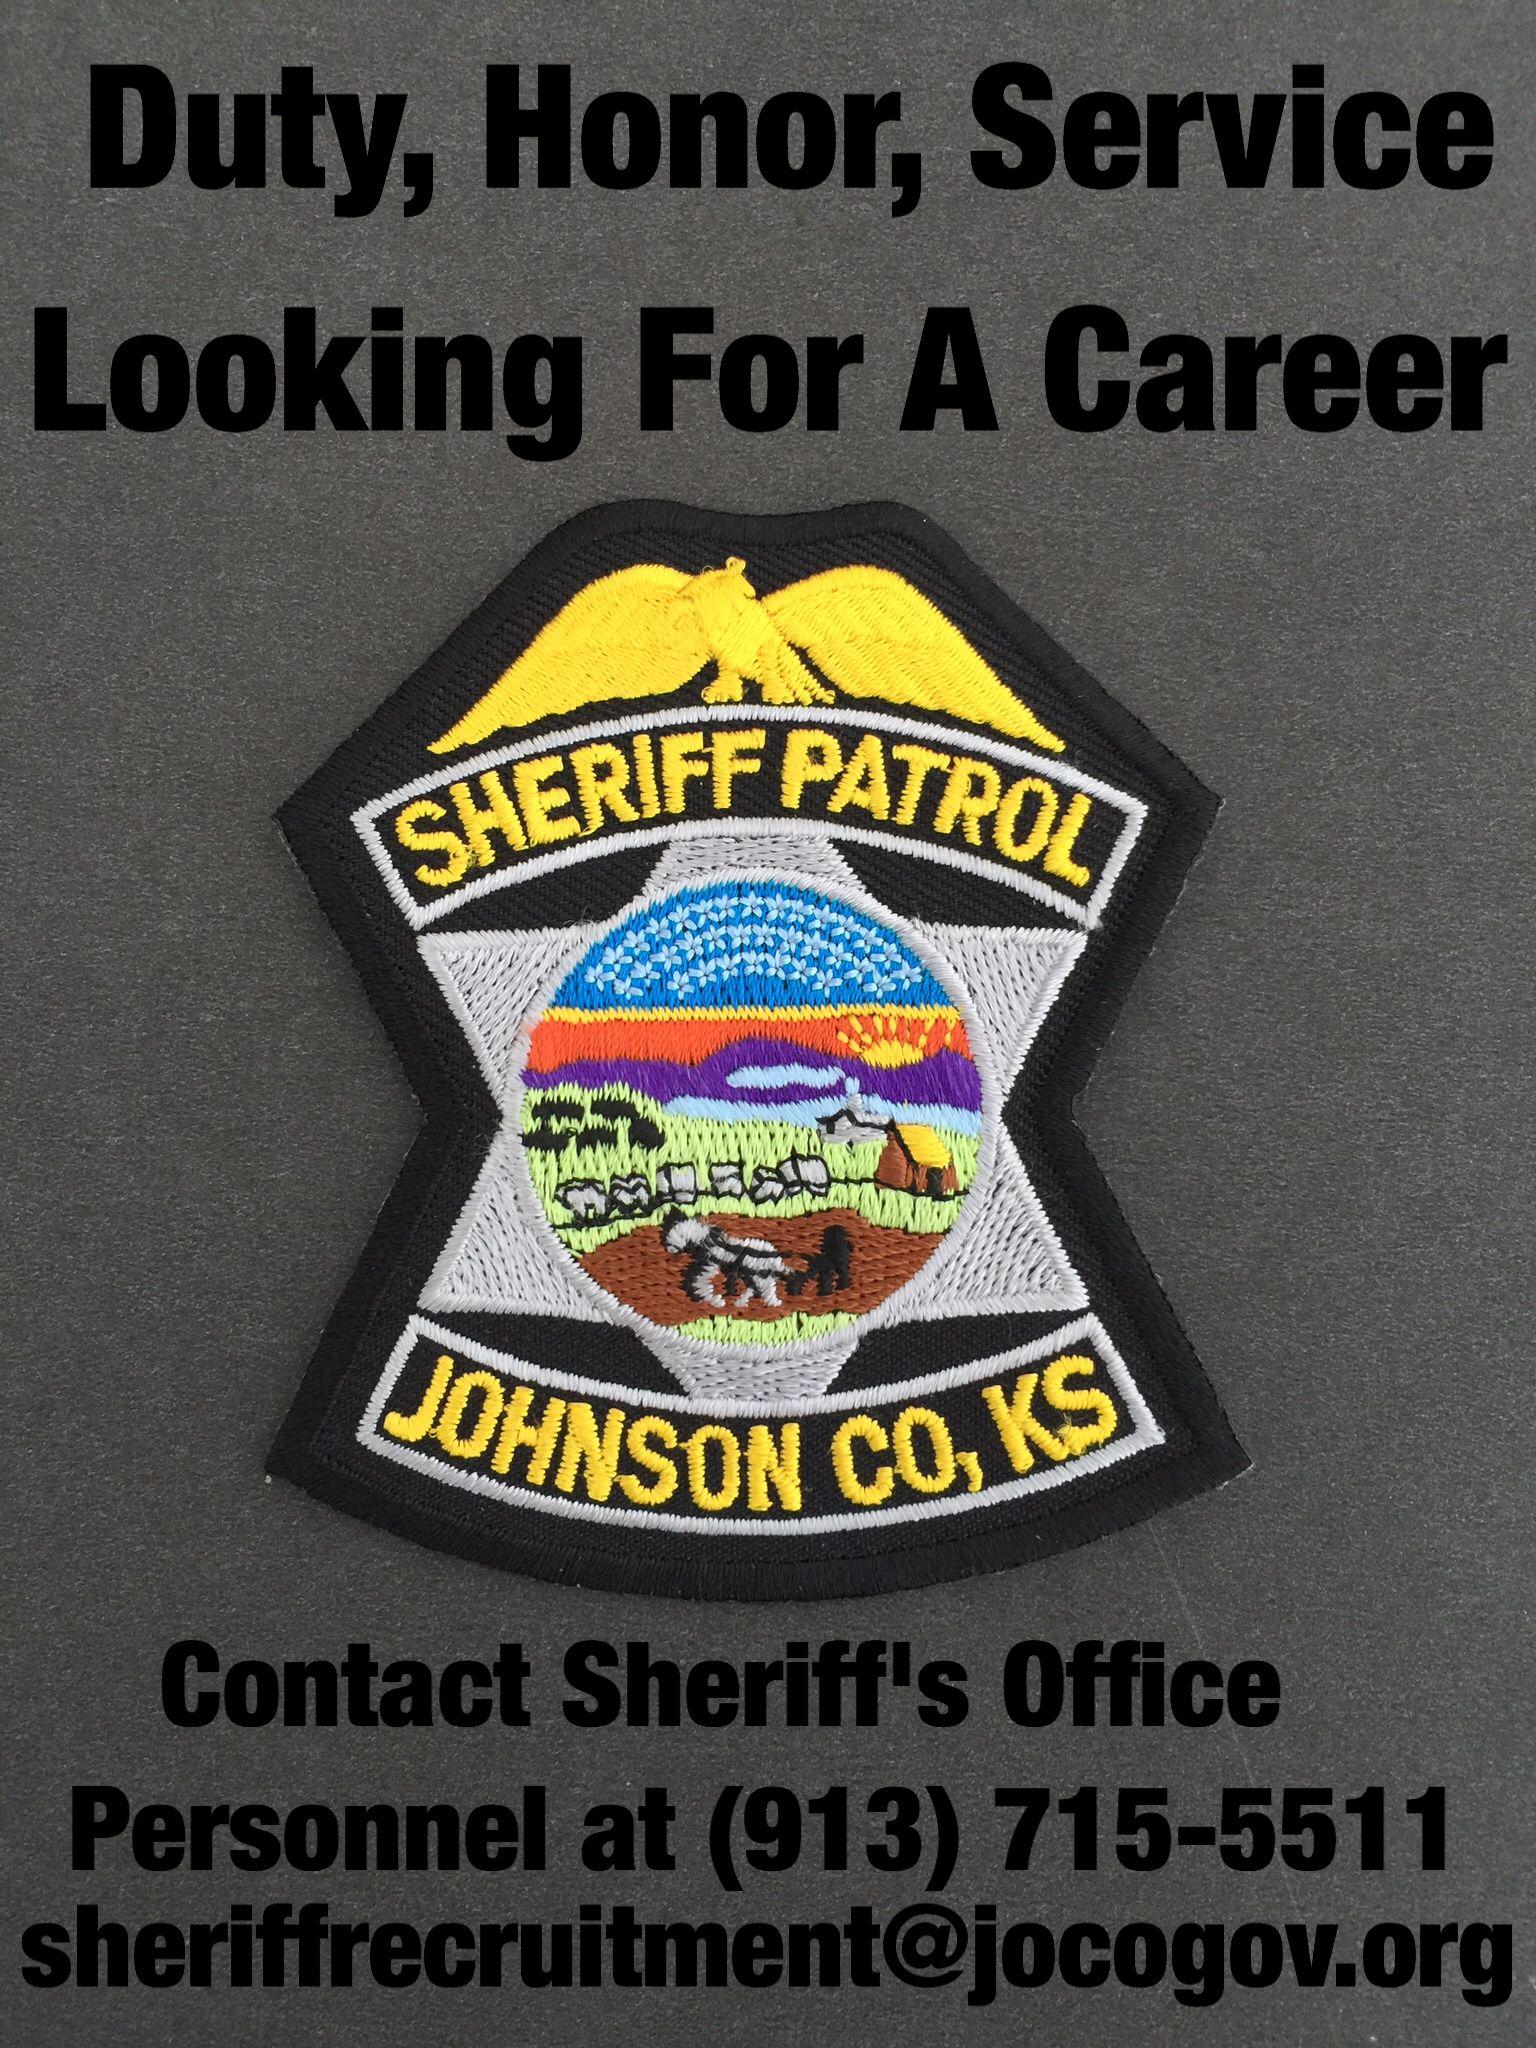 Duty honor service man office job opportunities law